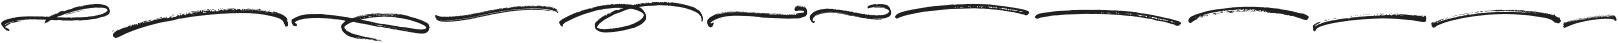 Hearthshore Swashes otf (400) Font LOWERCASE